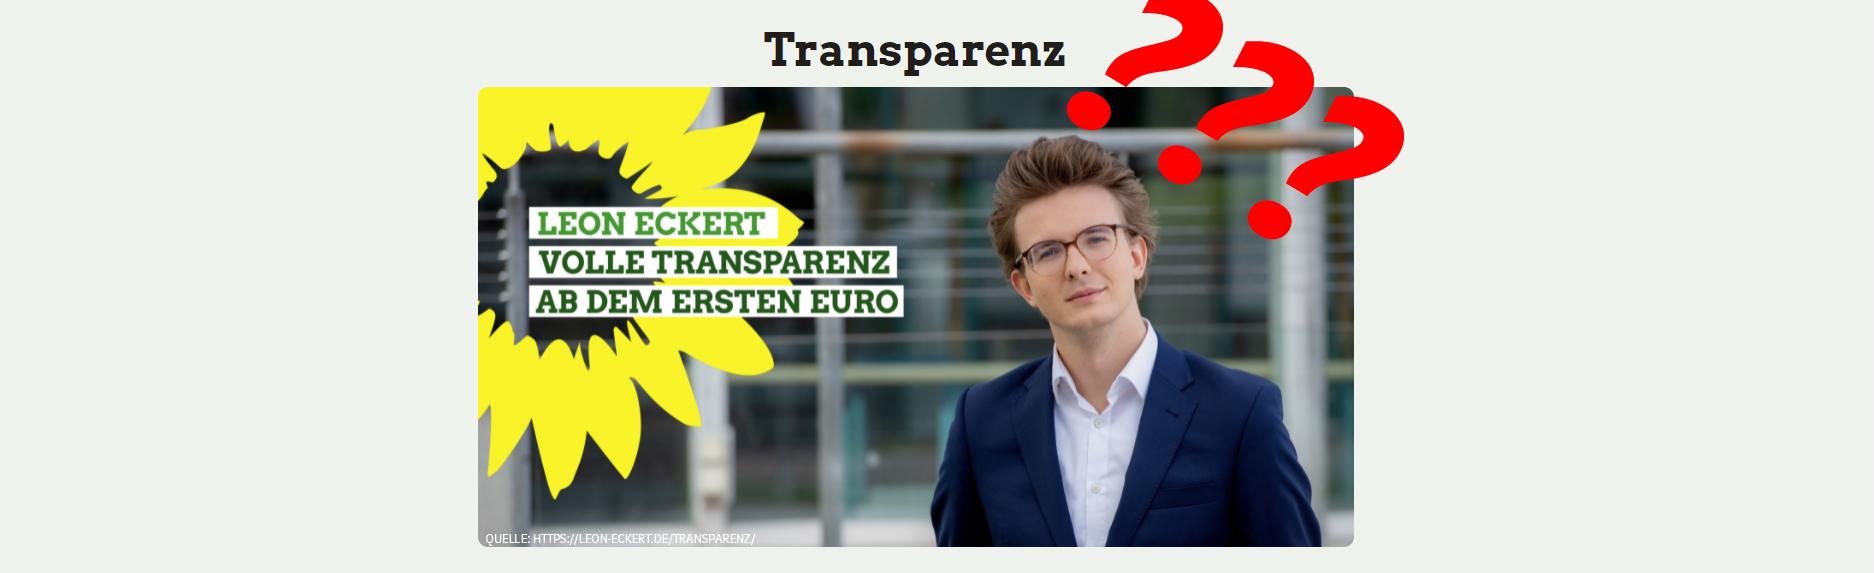 210816-LeonEckert-Transparenz